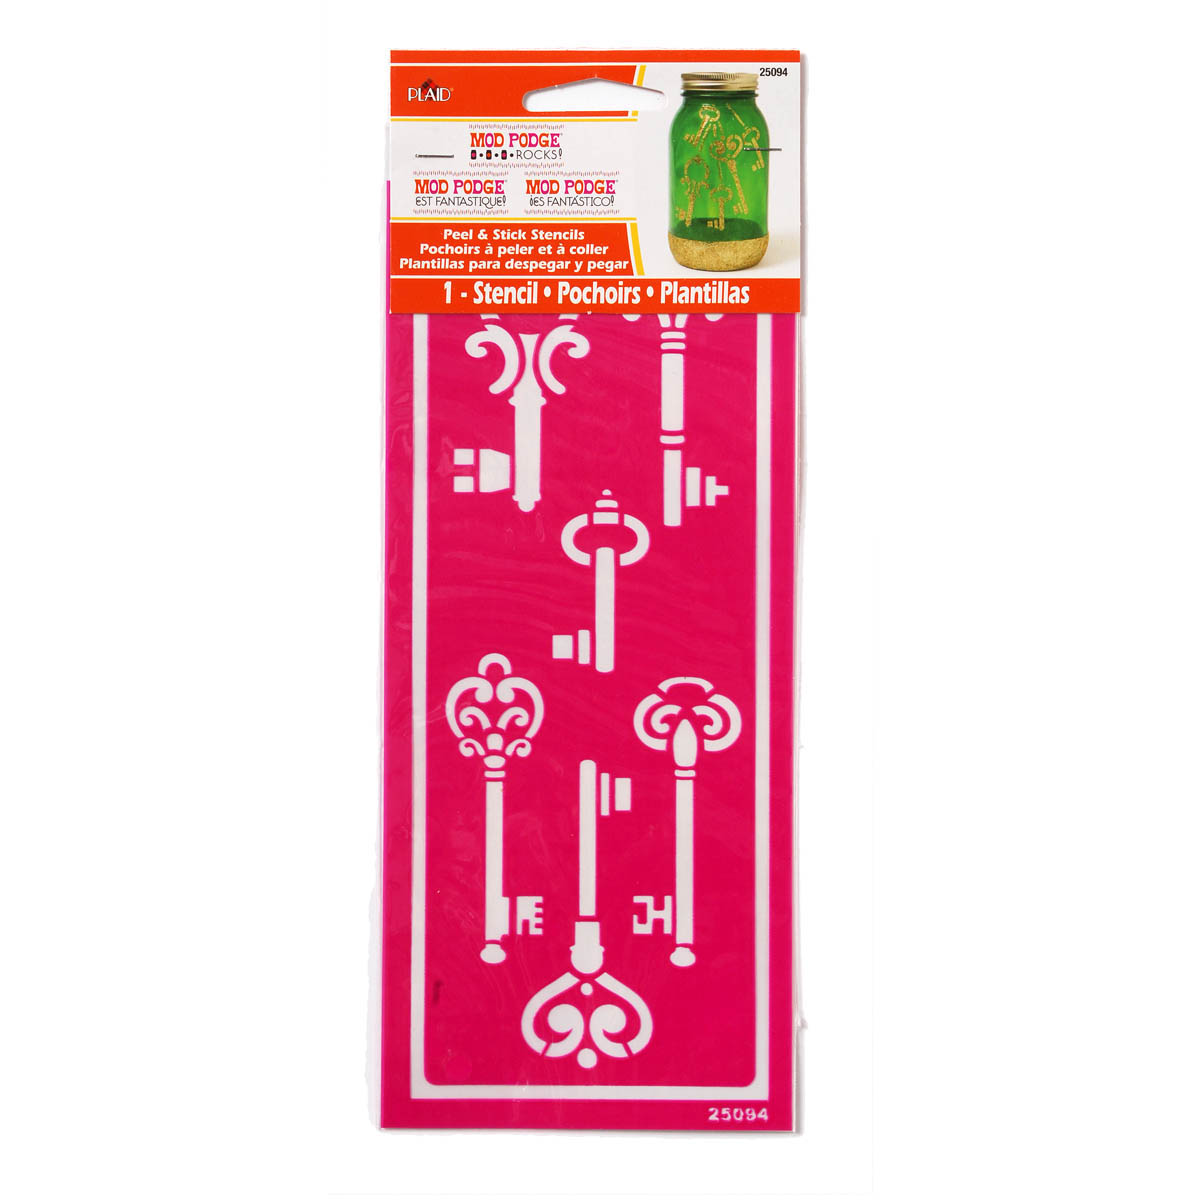 Mod Podge ® Rocks! Peel & Stick Stencils - Skeleton Keys - 25094